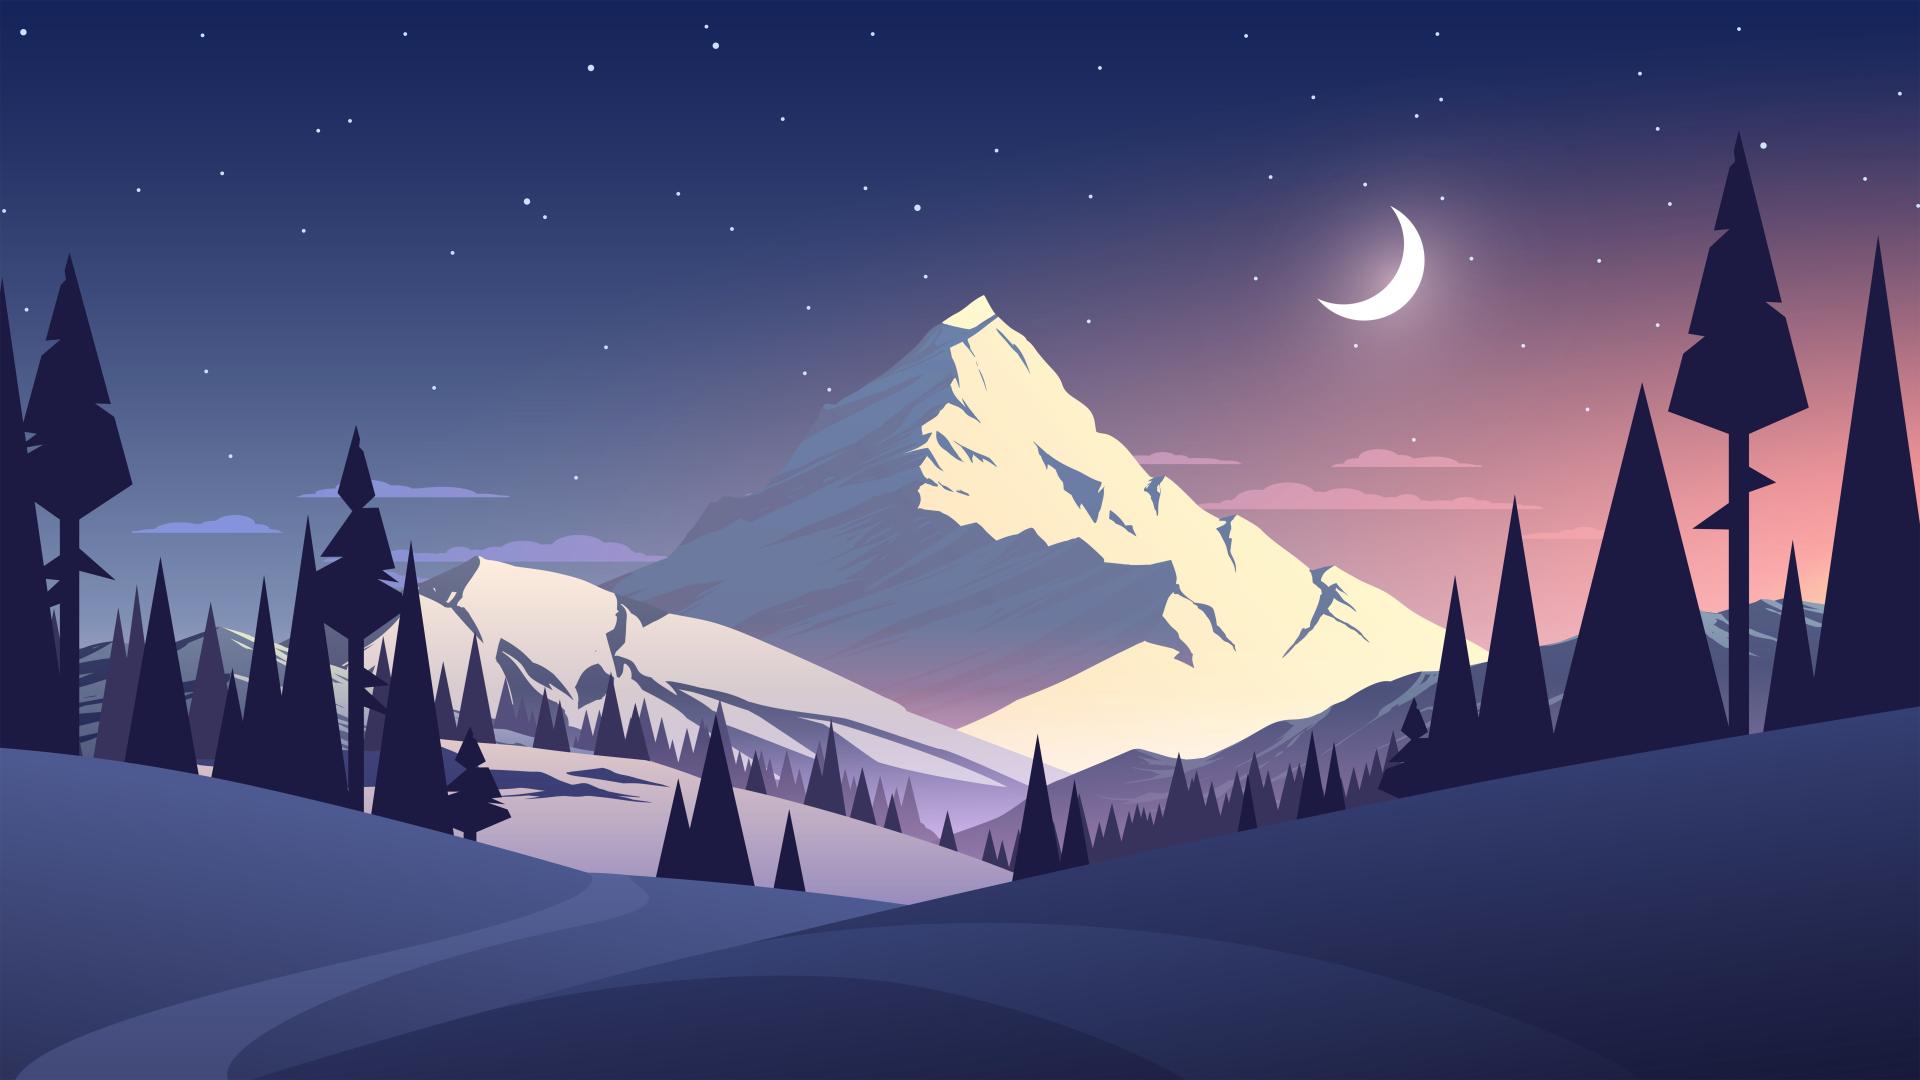 1920x1080 Night Mountains Summer Illustration 1080p Laptop Full Hd